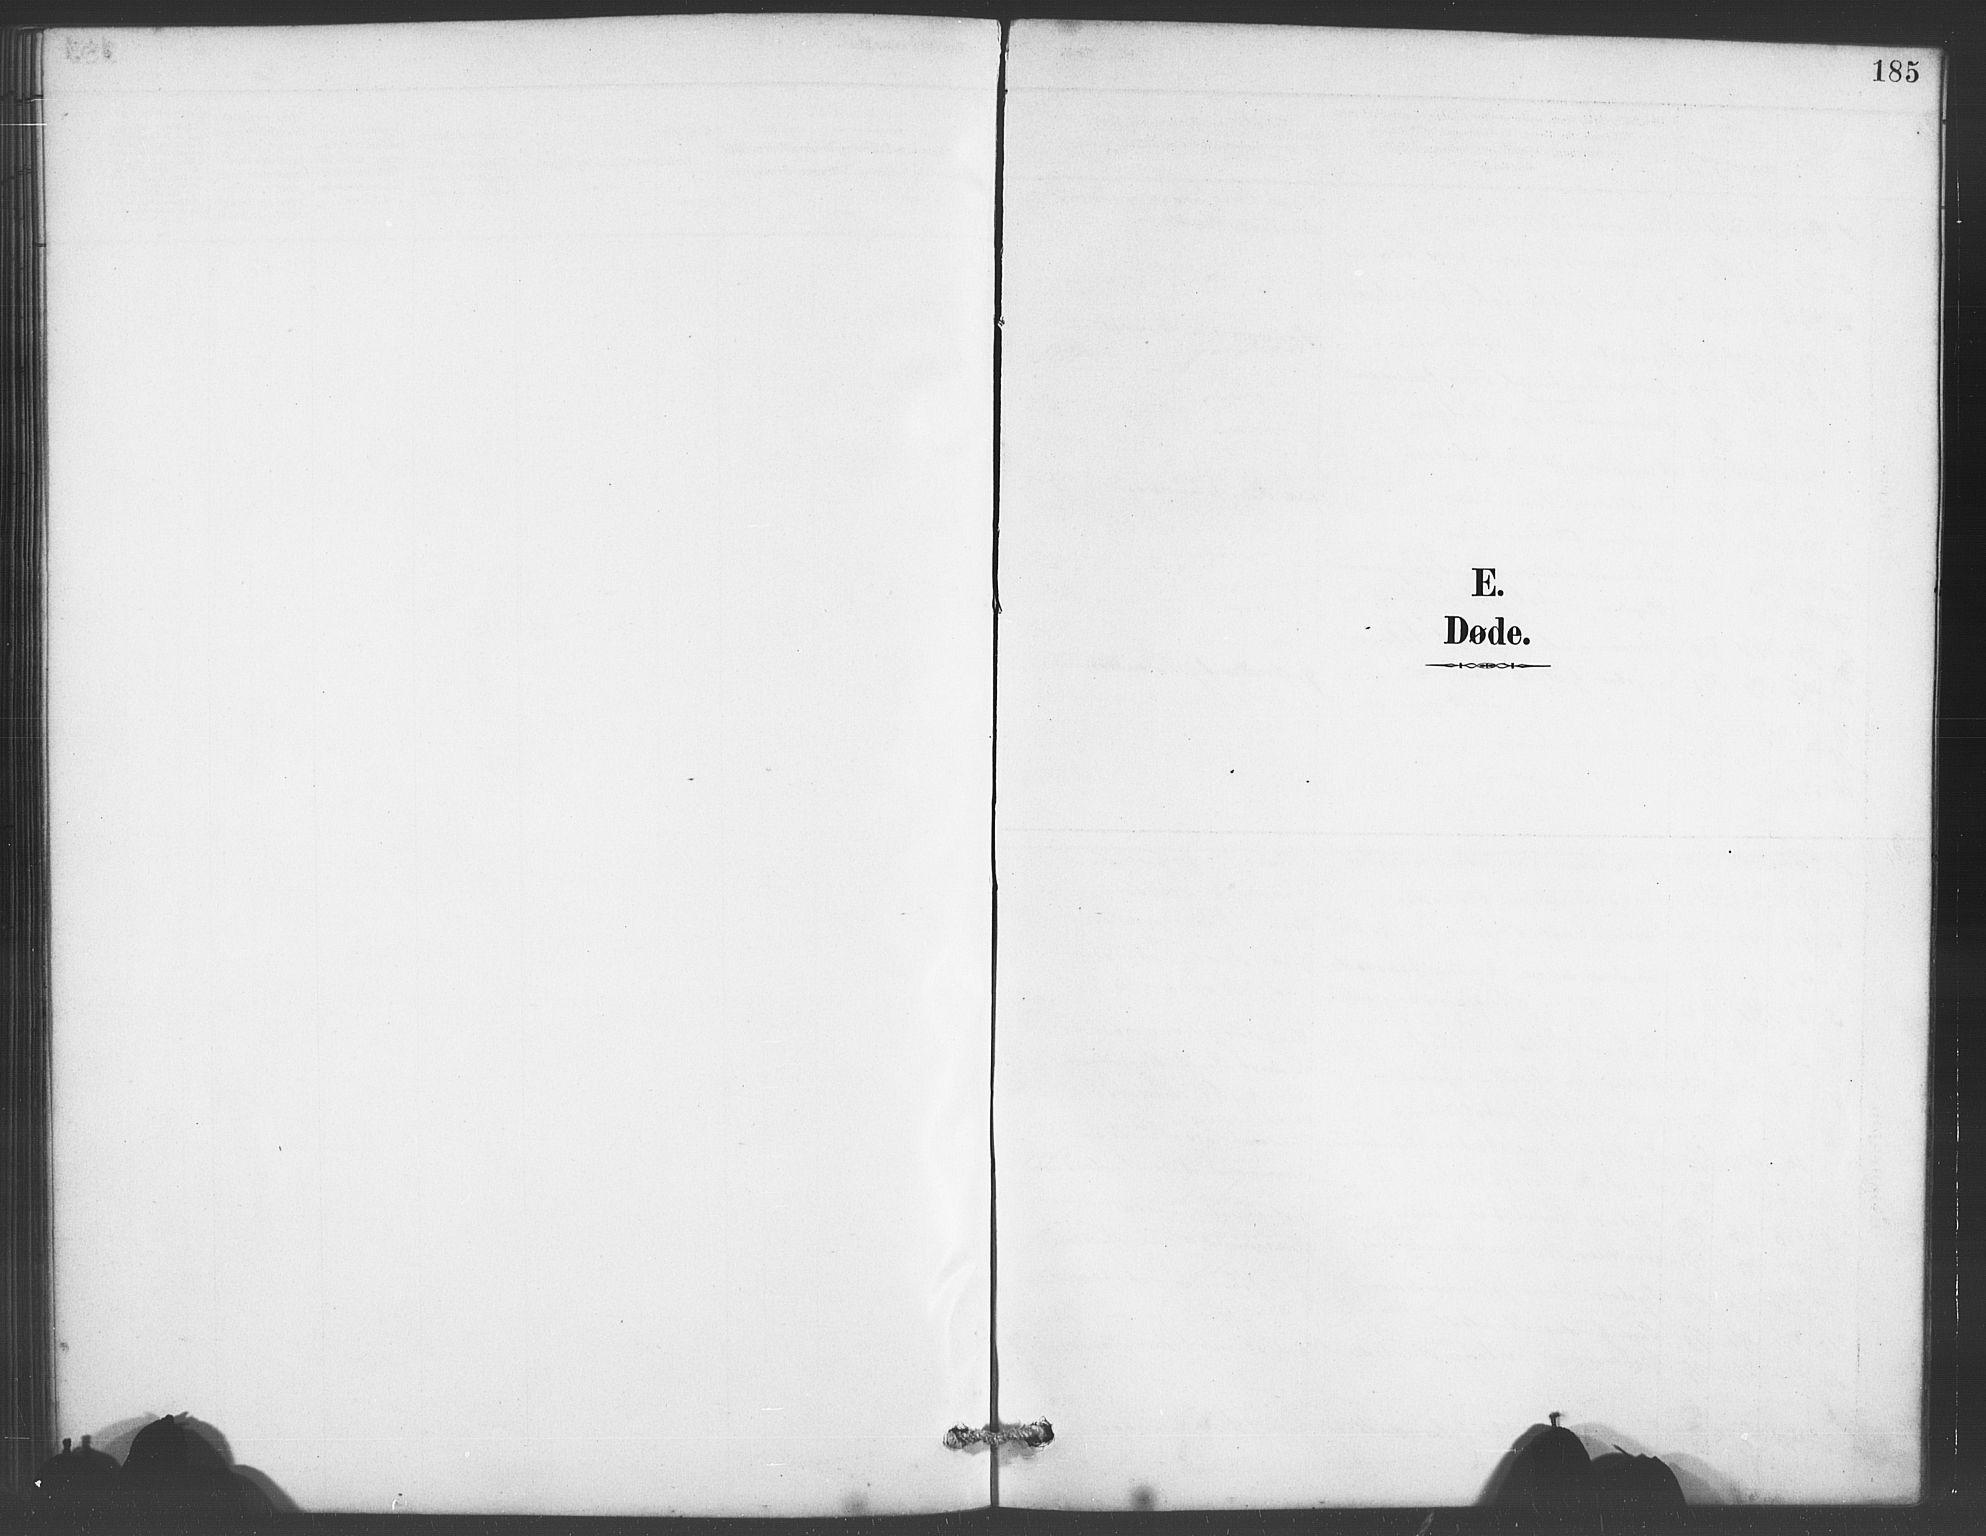 SAB, Evanger sokneprestembete*, Parish register (copy) no. A 4, 1887-1897, p. 185